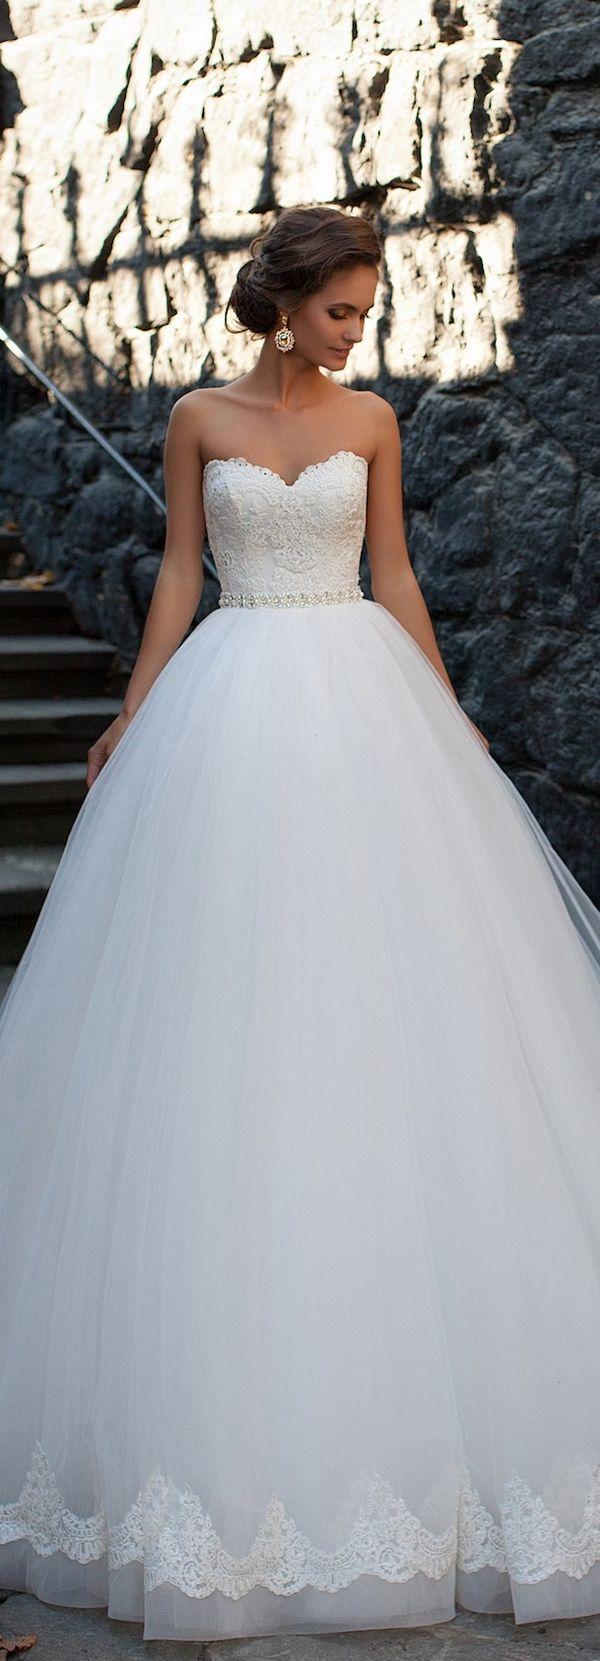 milla nova 2016 bridal wedding dresses / http://www.deerpearlflowers ...